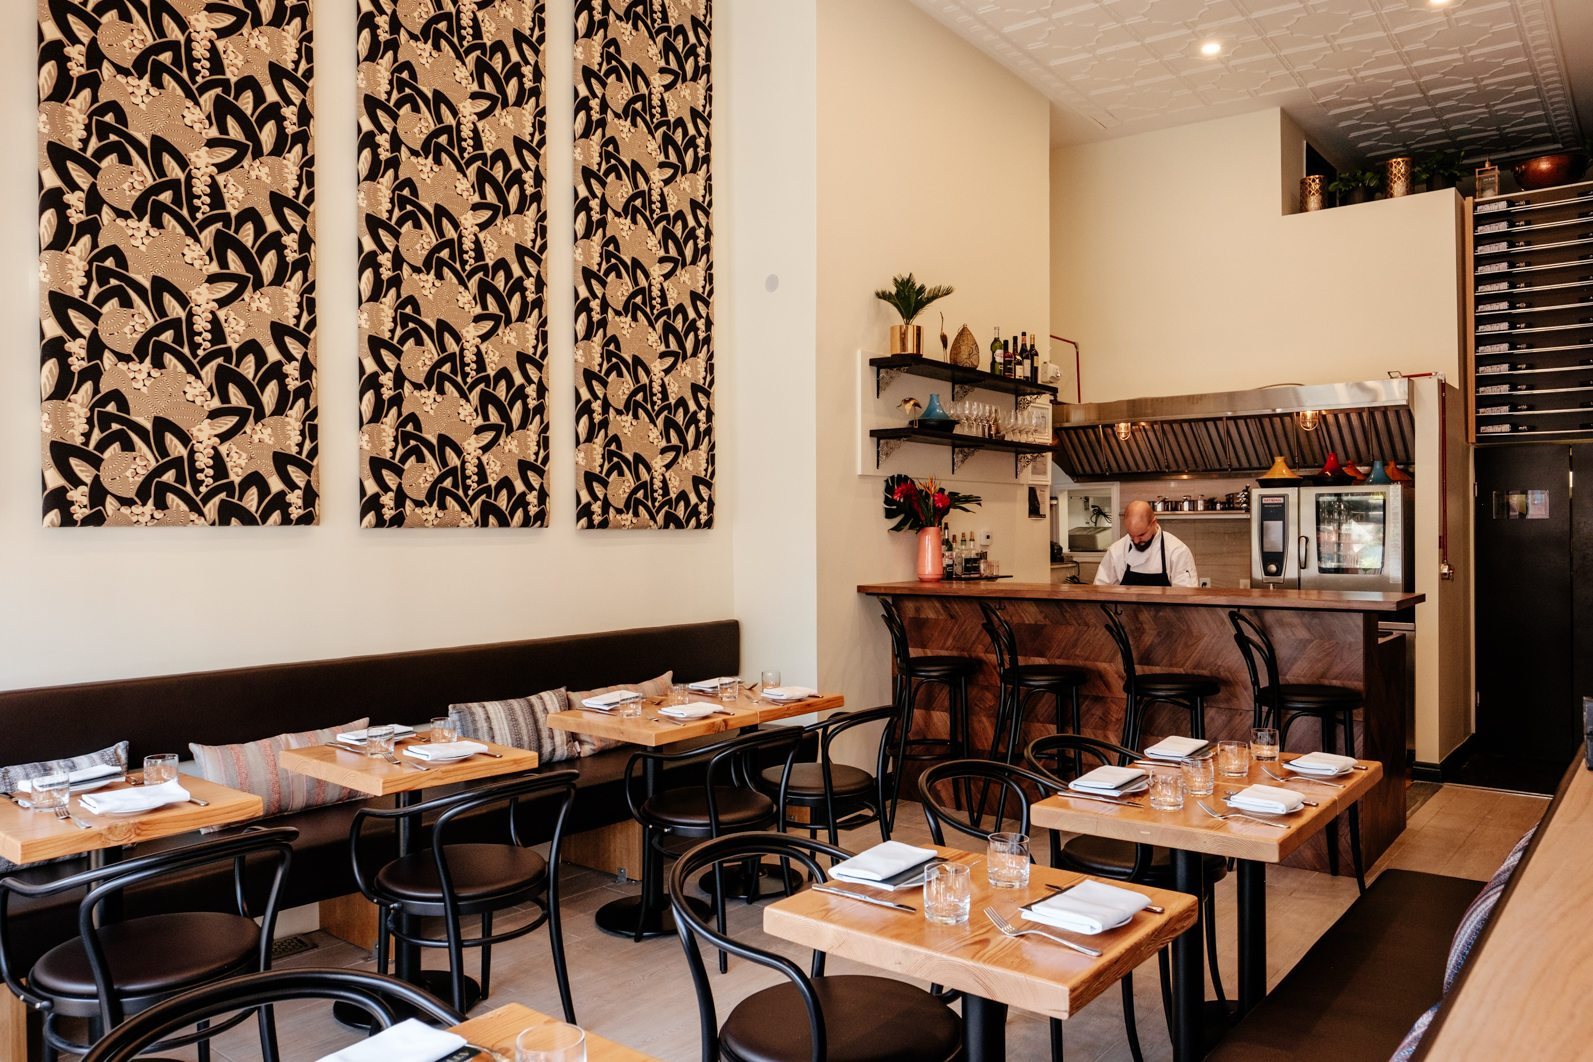 toronto-restaurants-atlas-moroccan-doug-penfold-annex-room-2